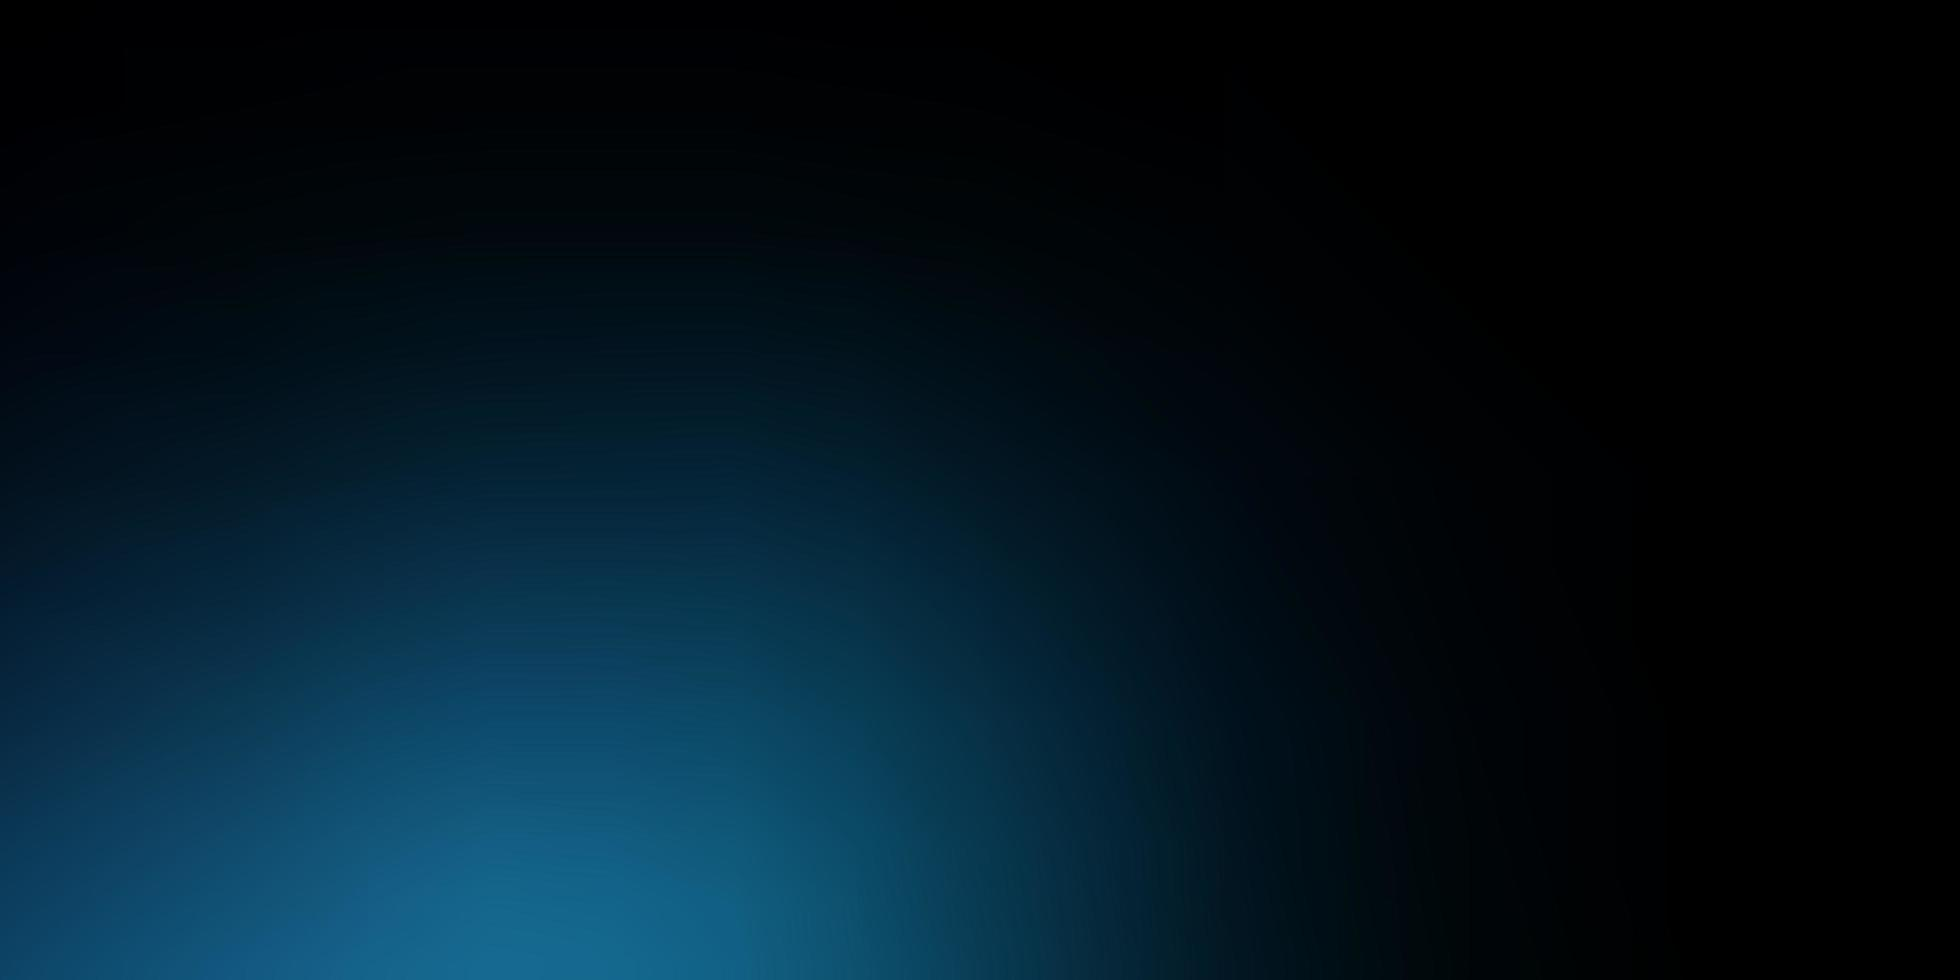 modelo turvo azul escuro. vetor